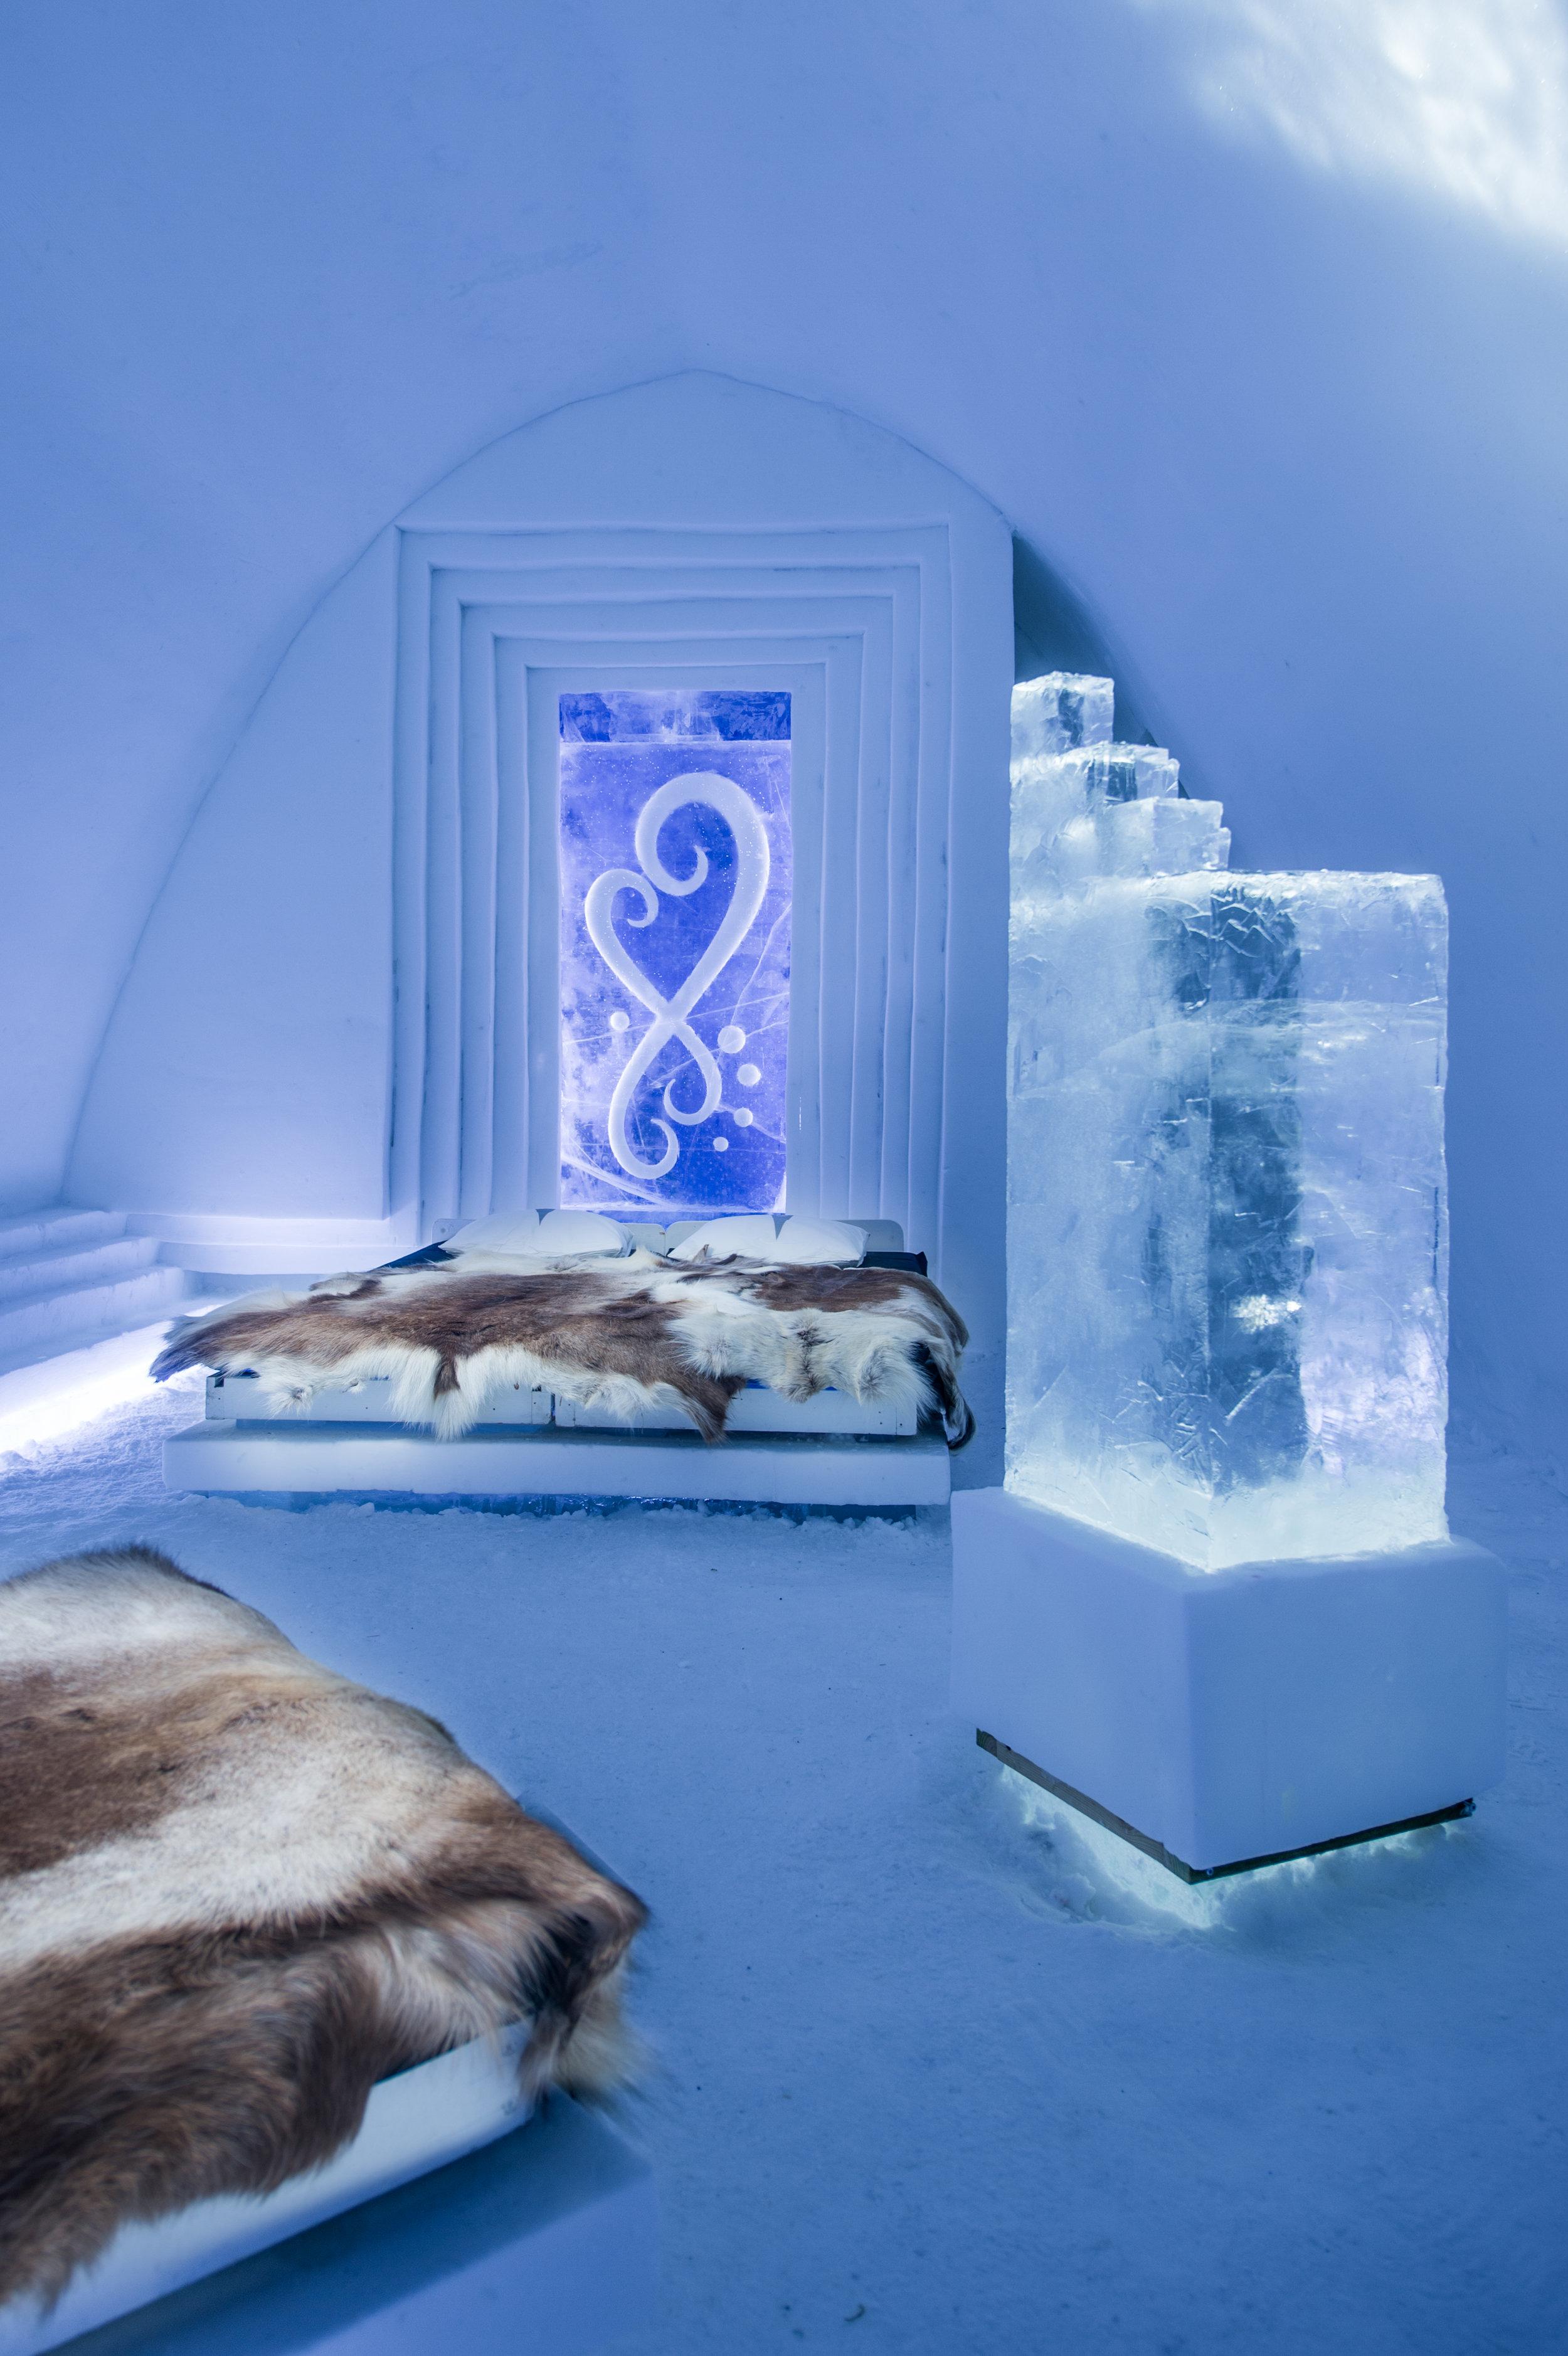 INFINITLOVE-João Mota & Volker Schnüttgen-- icehotel 27 - by Asaf Kliger (1 of 1).jpg